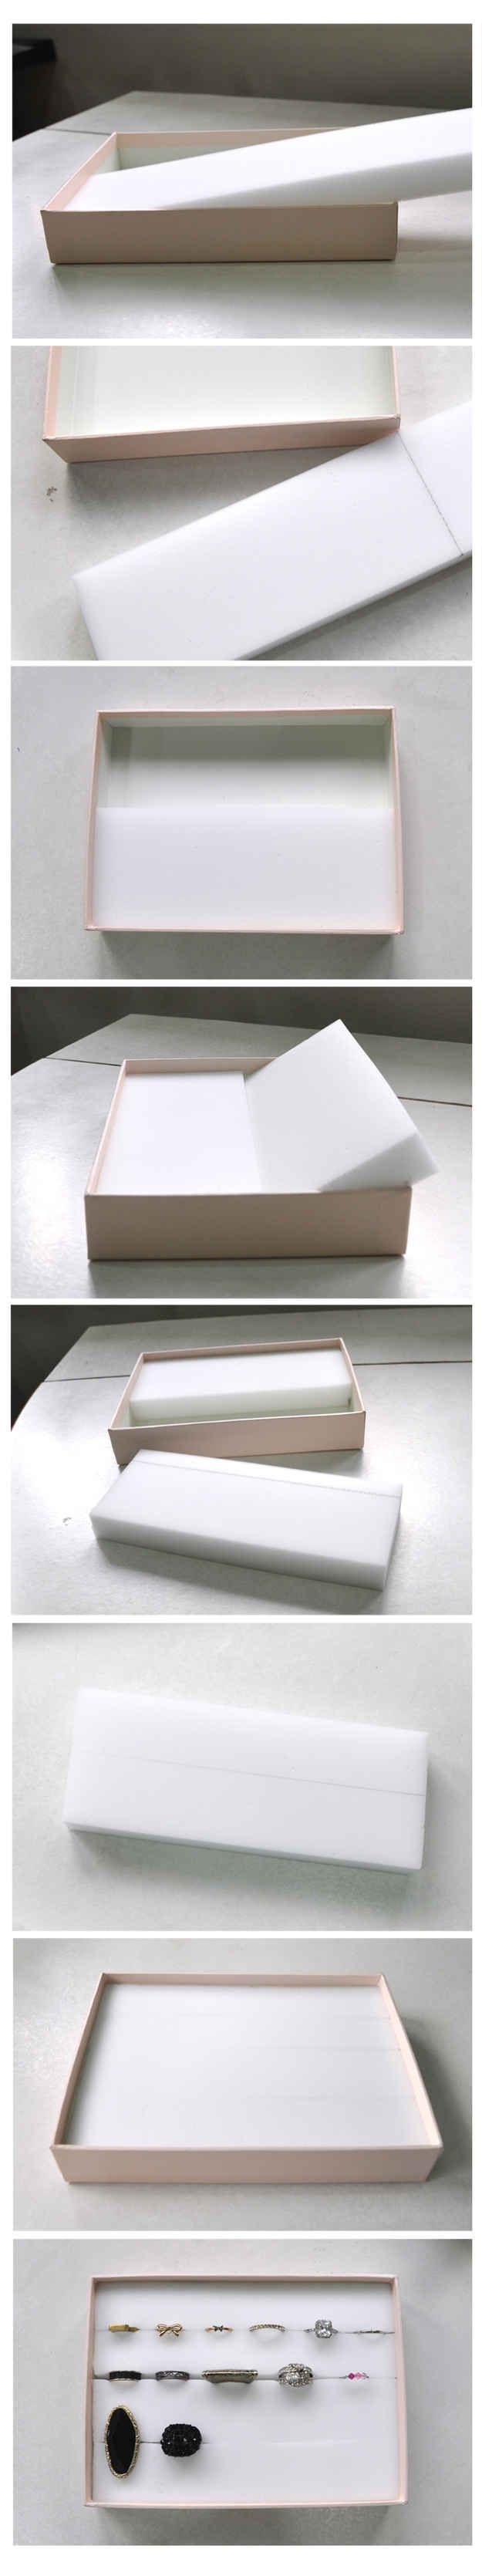 Earing organizer in a box